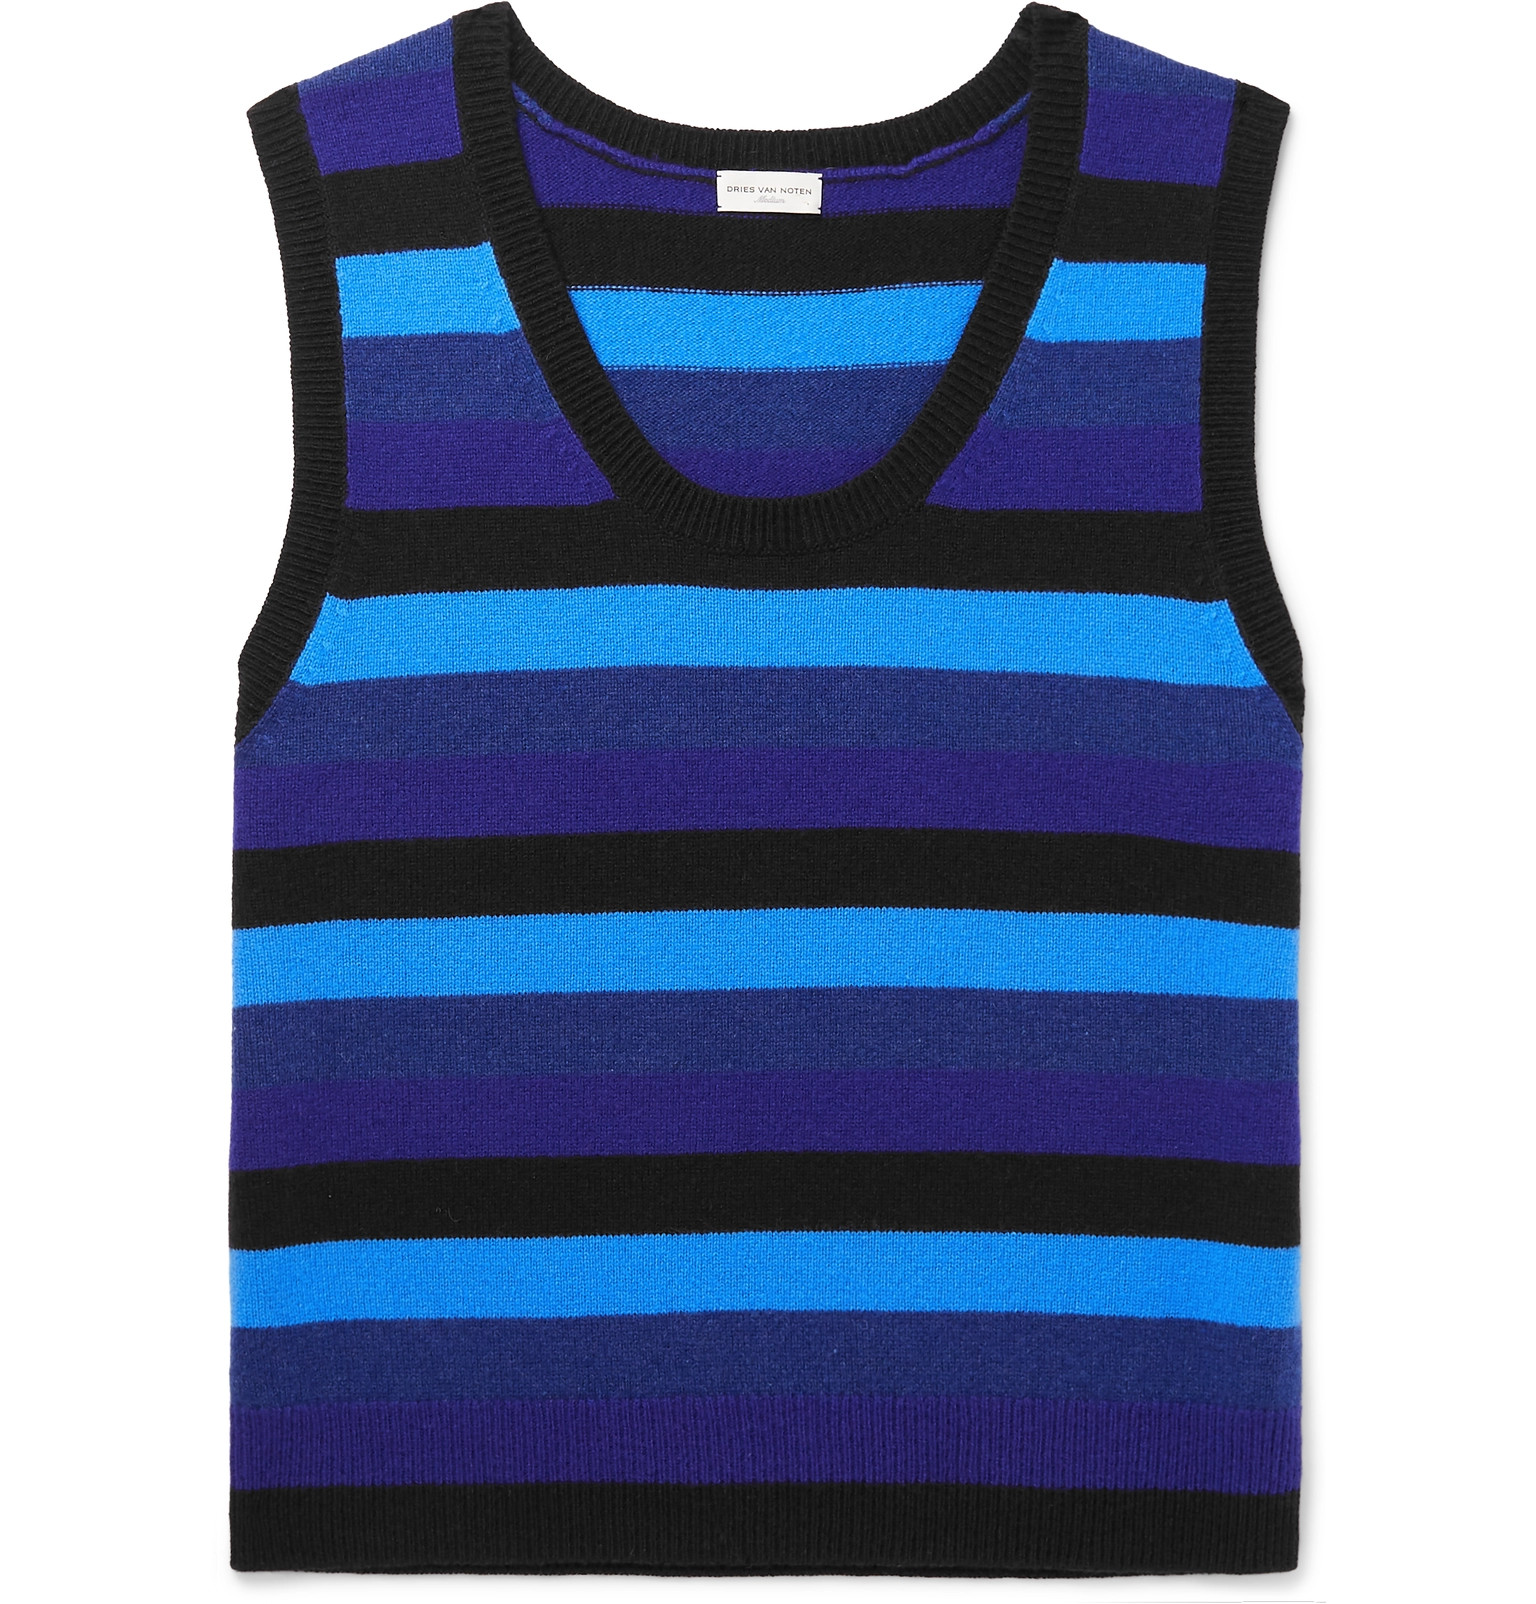 98c08f70b14ae6 Dries Van Noten - Striped Merino Wool Sweater Vest